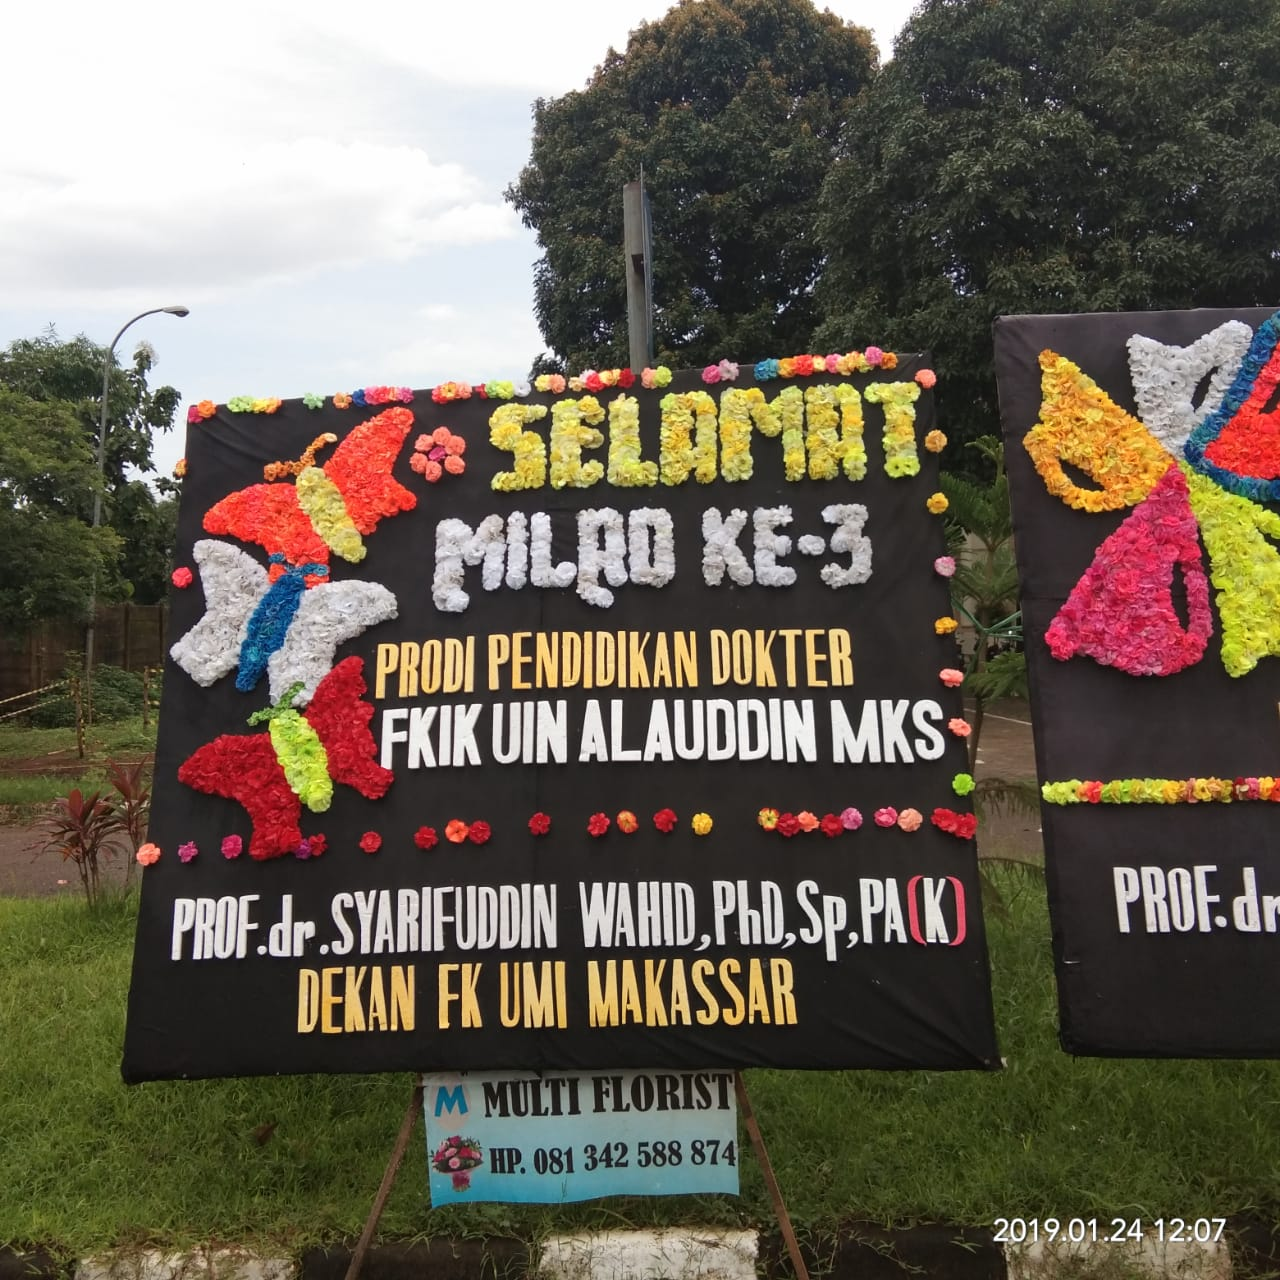 Ucapan Selamat Milad Ke 3 PSPD oleh Dekan FK UMI